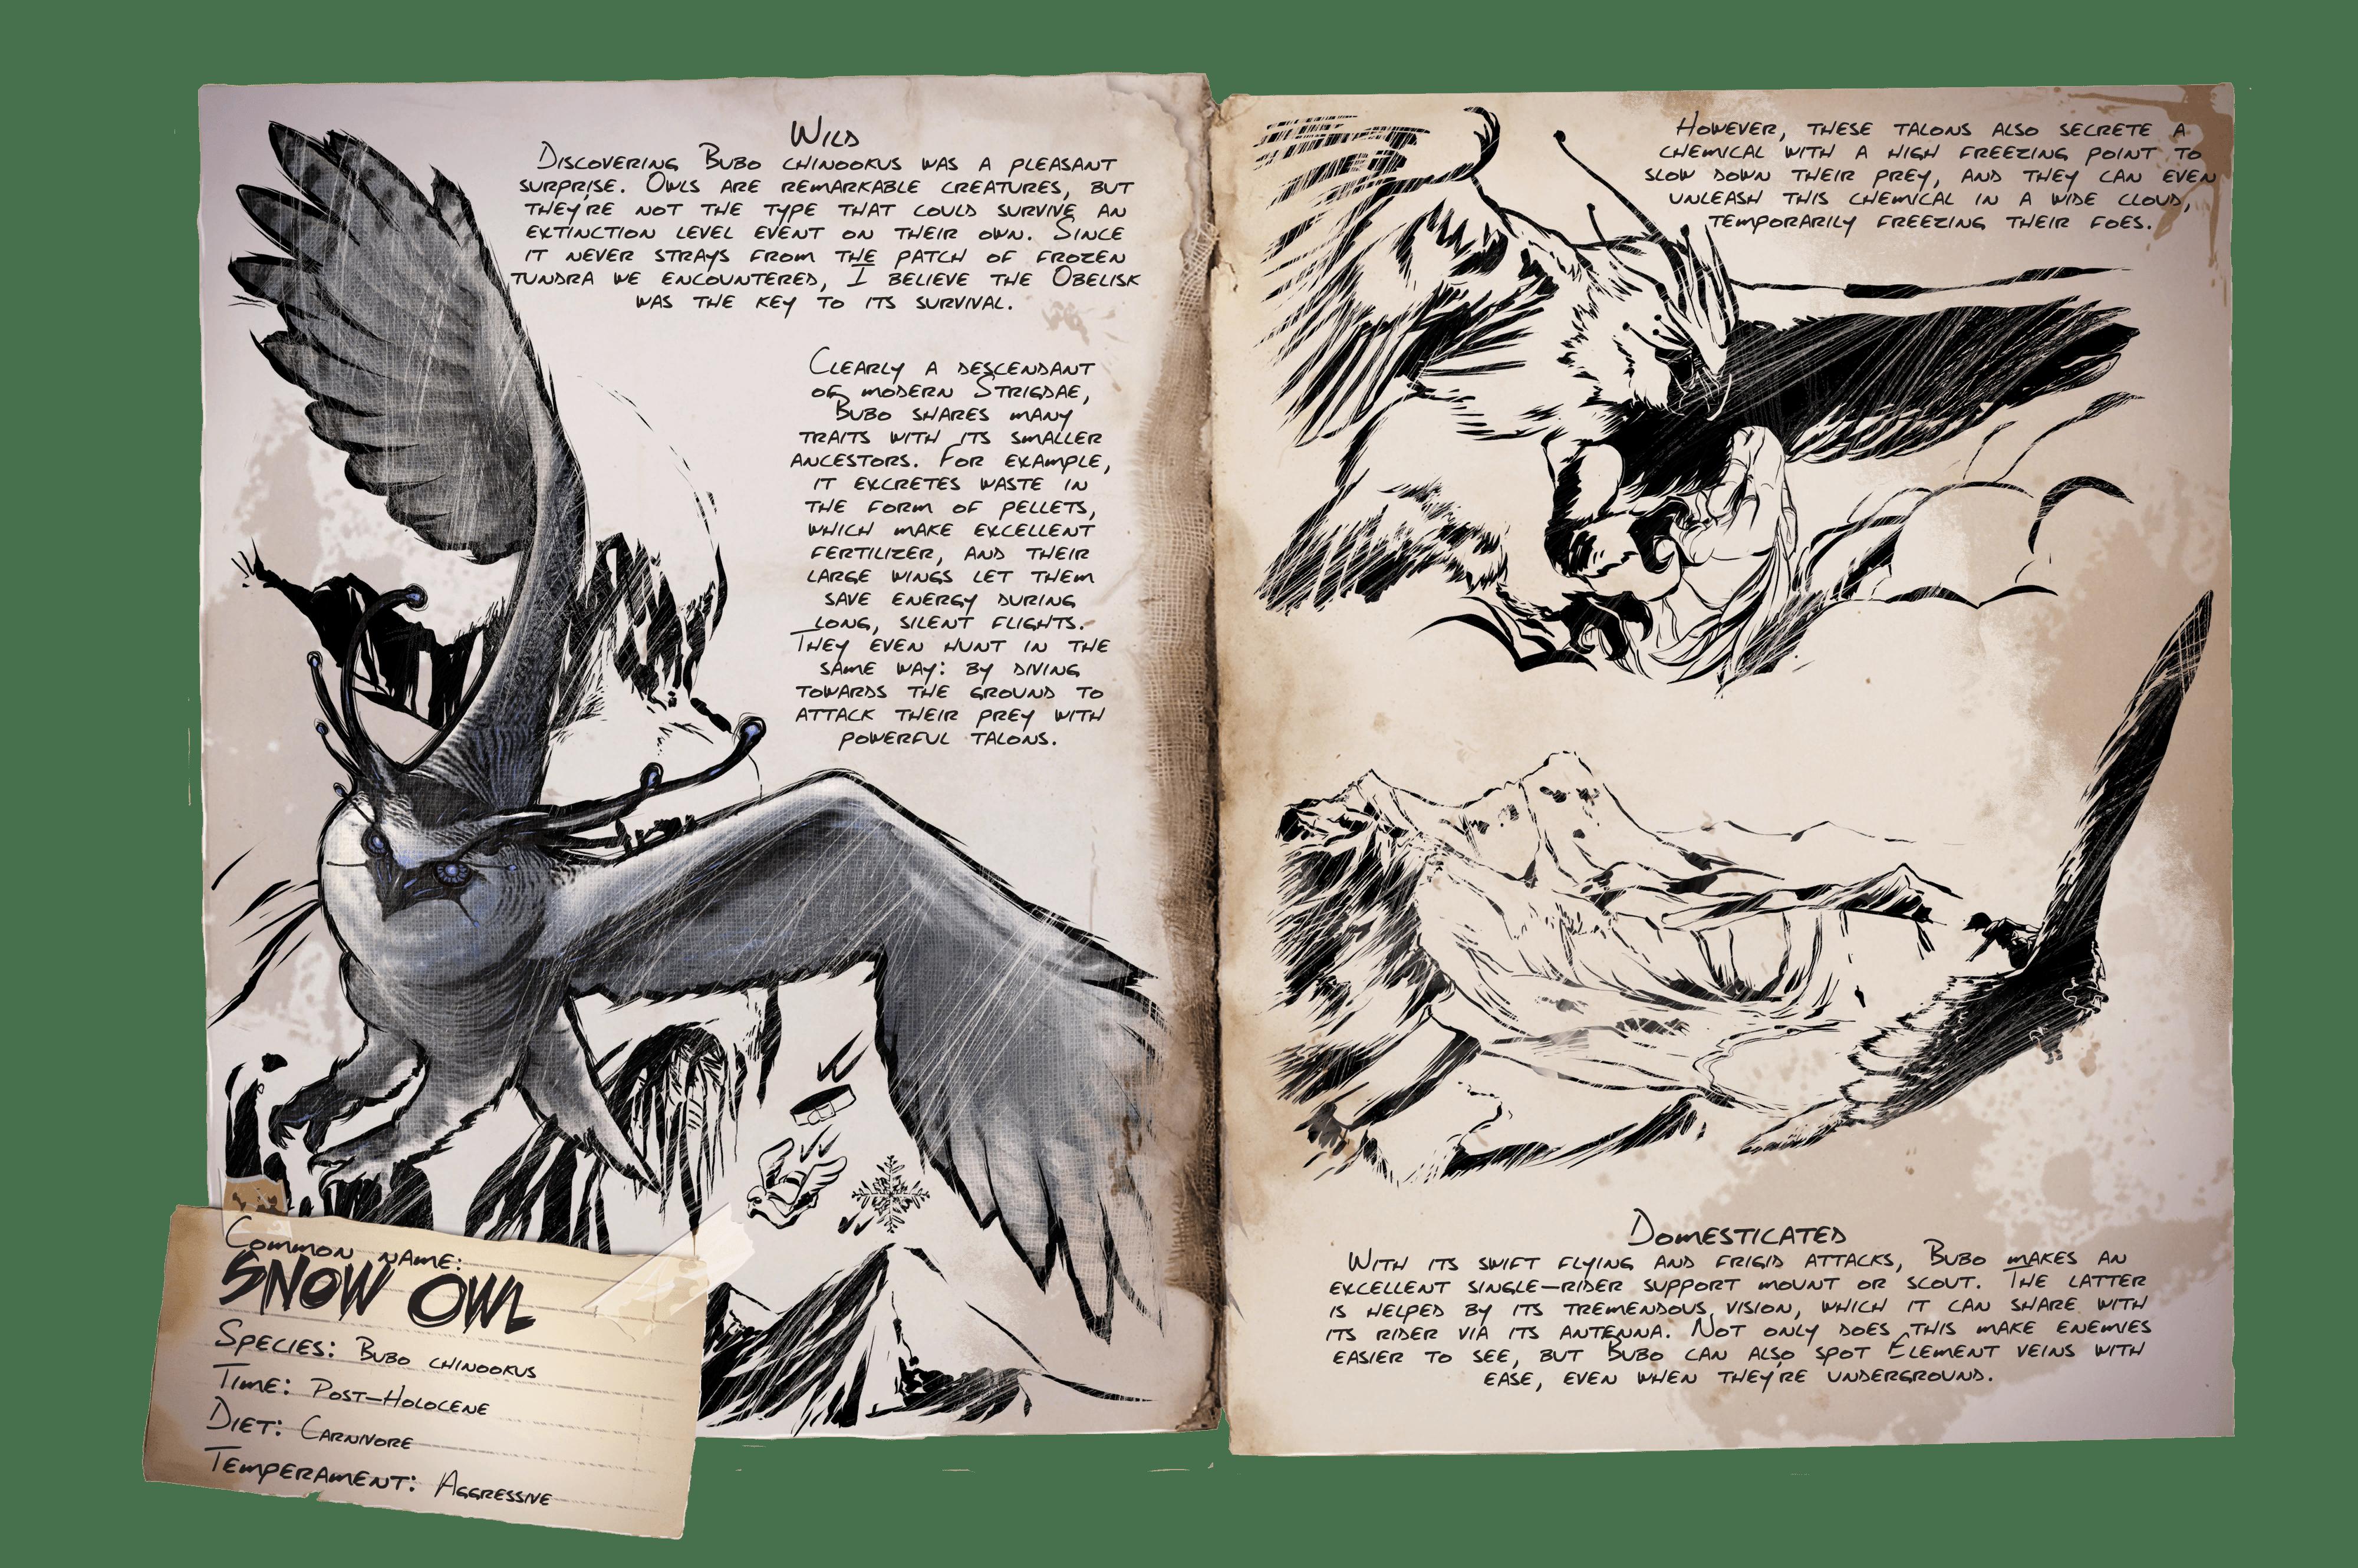 Dino Dossier: Snow Owl